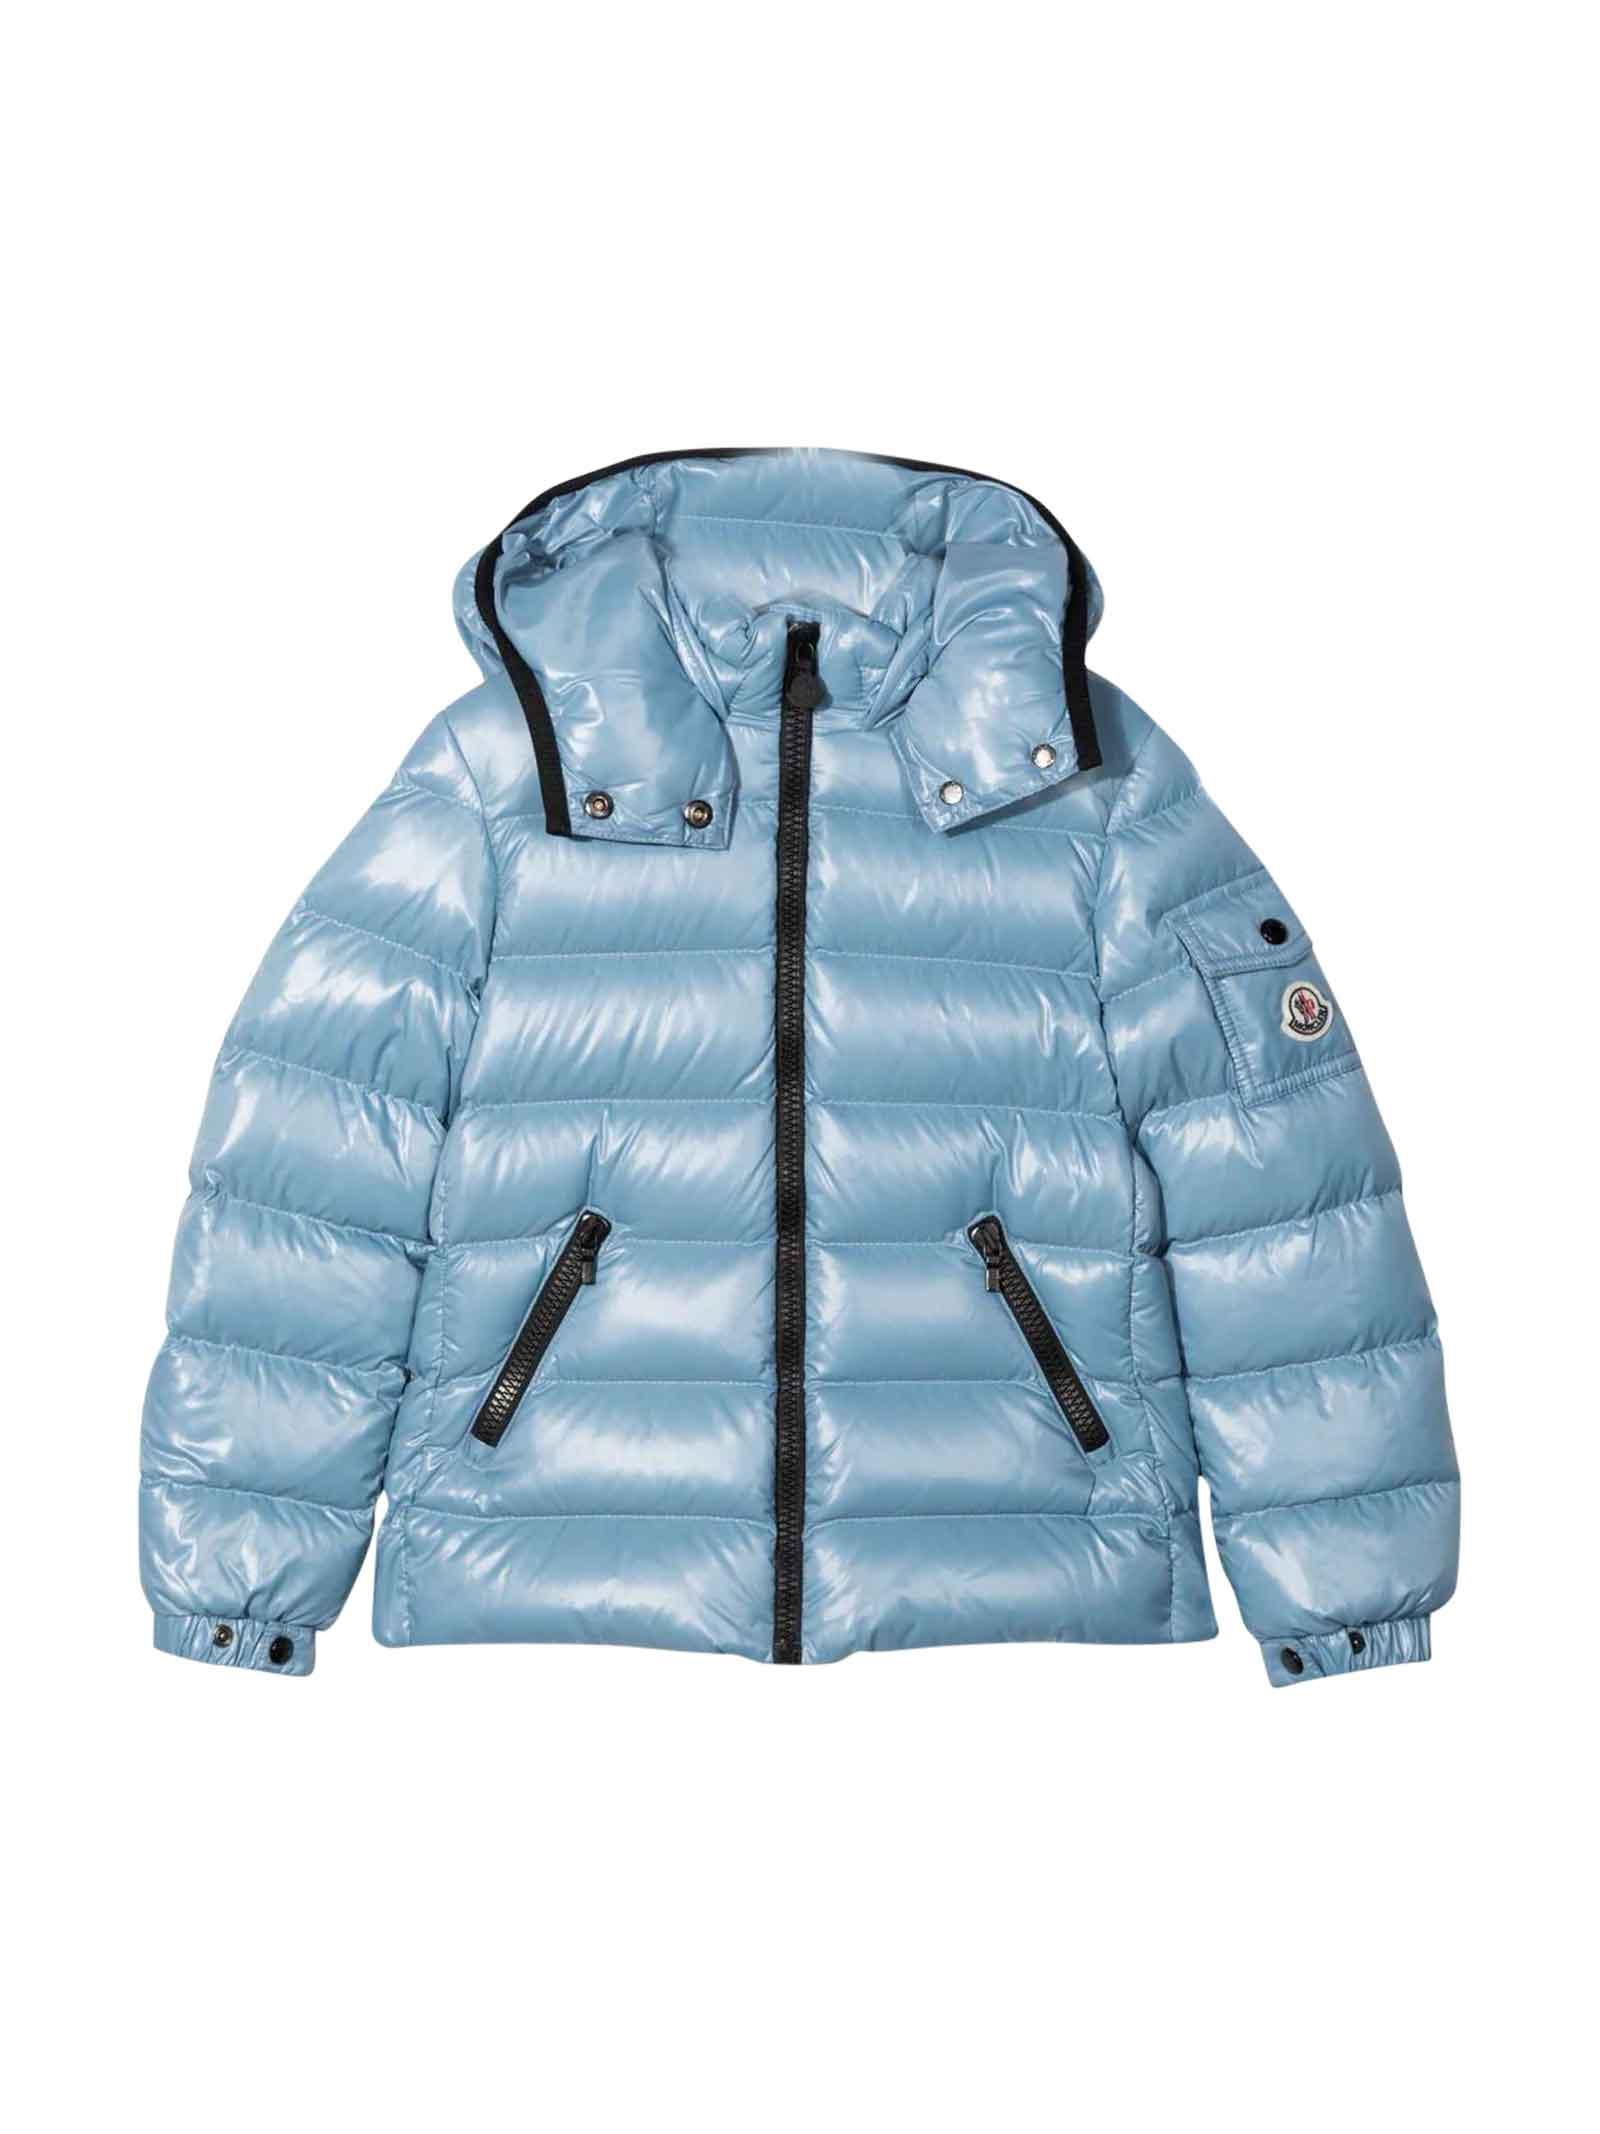 Moncler Moncler Enfant Unisex Light Blue Down Jacket